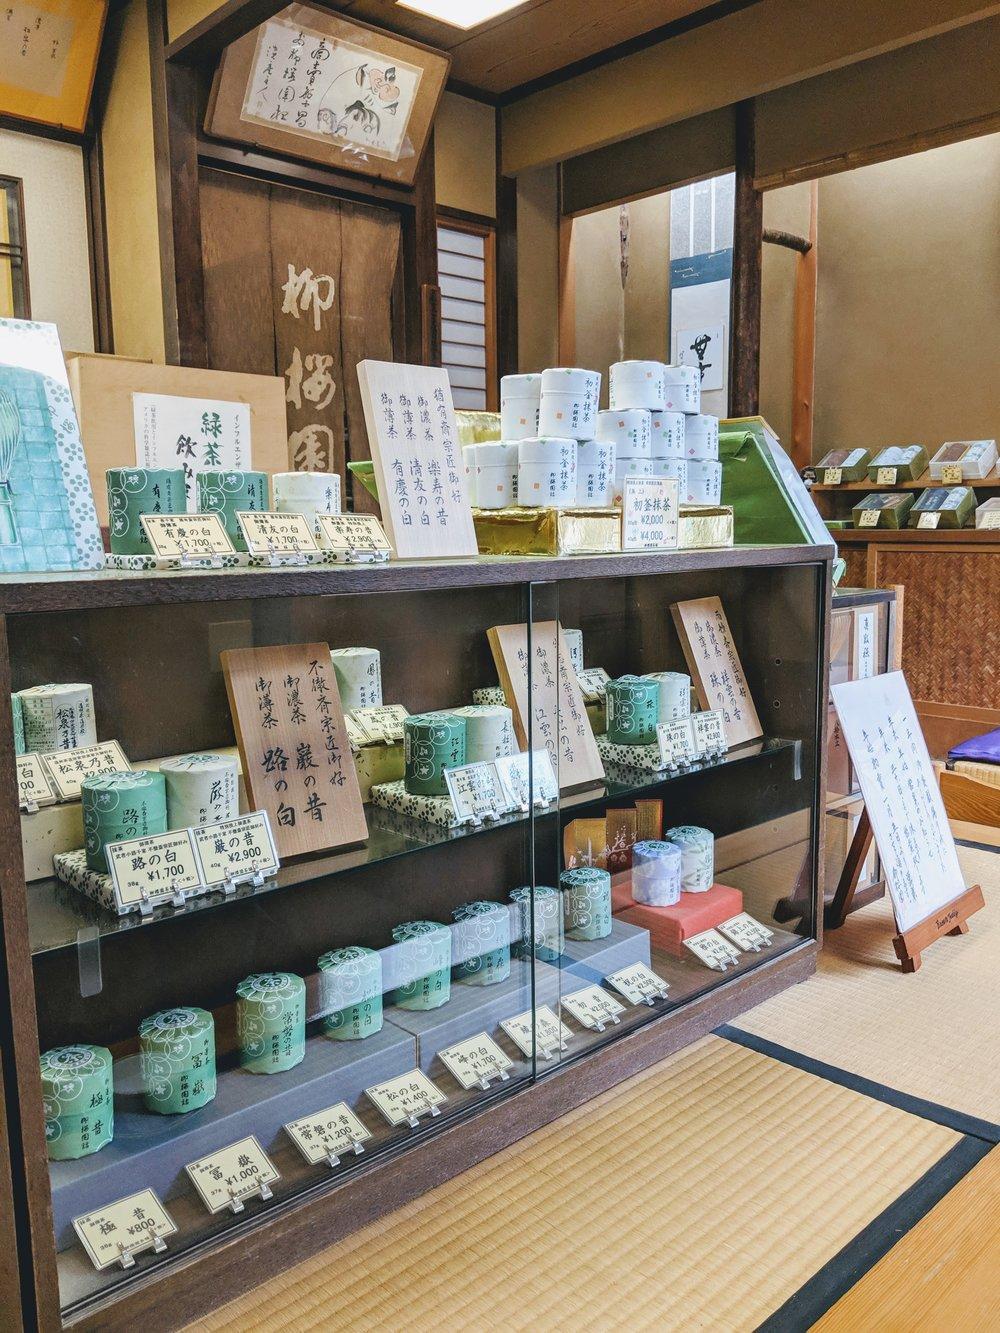 Ryuoen tea store in Kyoto